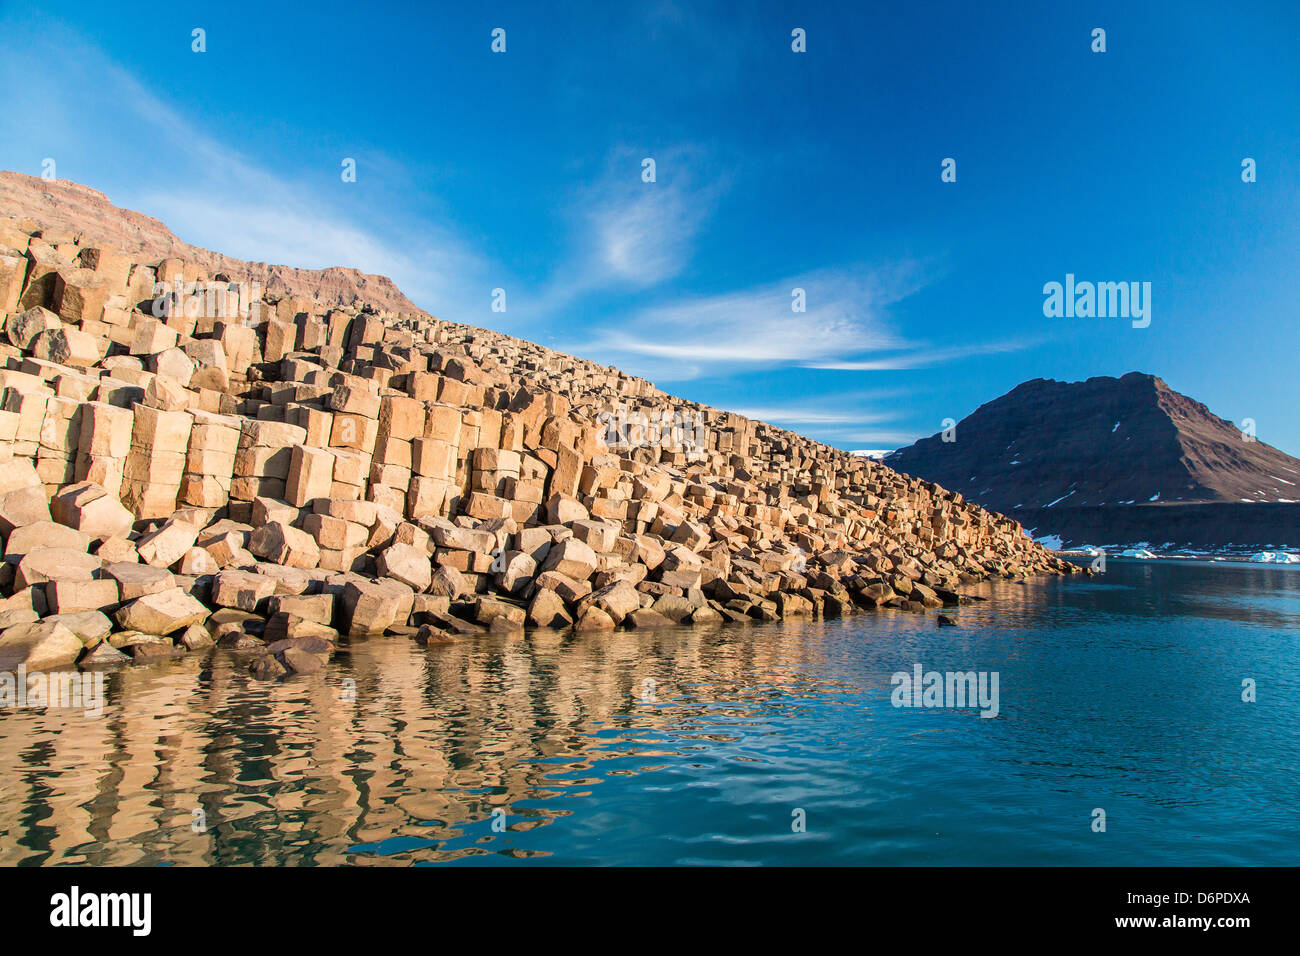 Columnar basalt, Vikingbukta (Viking Bay), Scoresbysund, Northeast Greenland, Polar Regions - Stock Image